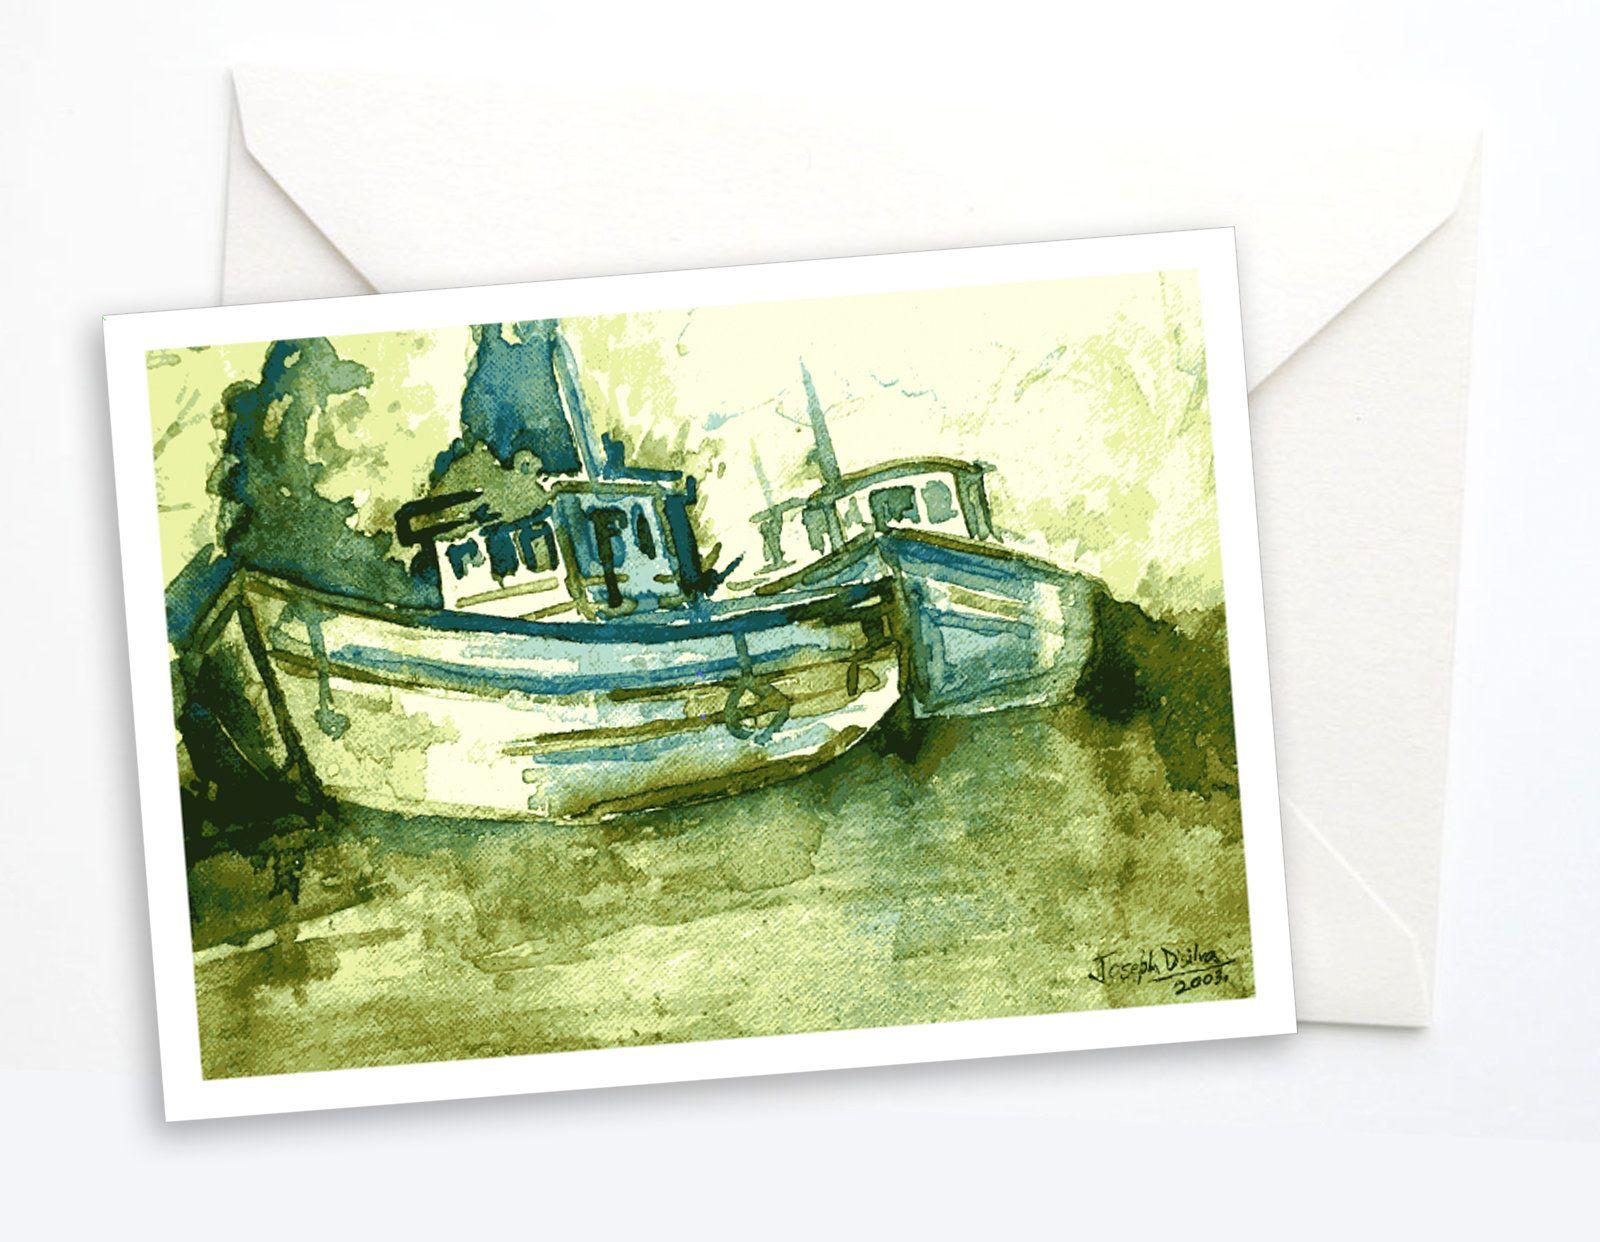 Goan Fishing Boats | Note Card | Greeting Card #CardForFriend #TravelNoteCard #RiverBank #FishingBoats #GreenNature #CountrysideArt #IndianVillage #CardForHim #GoaIndia #VacationGreeting